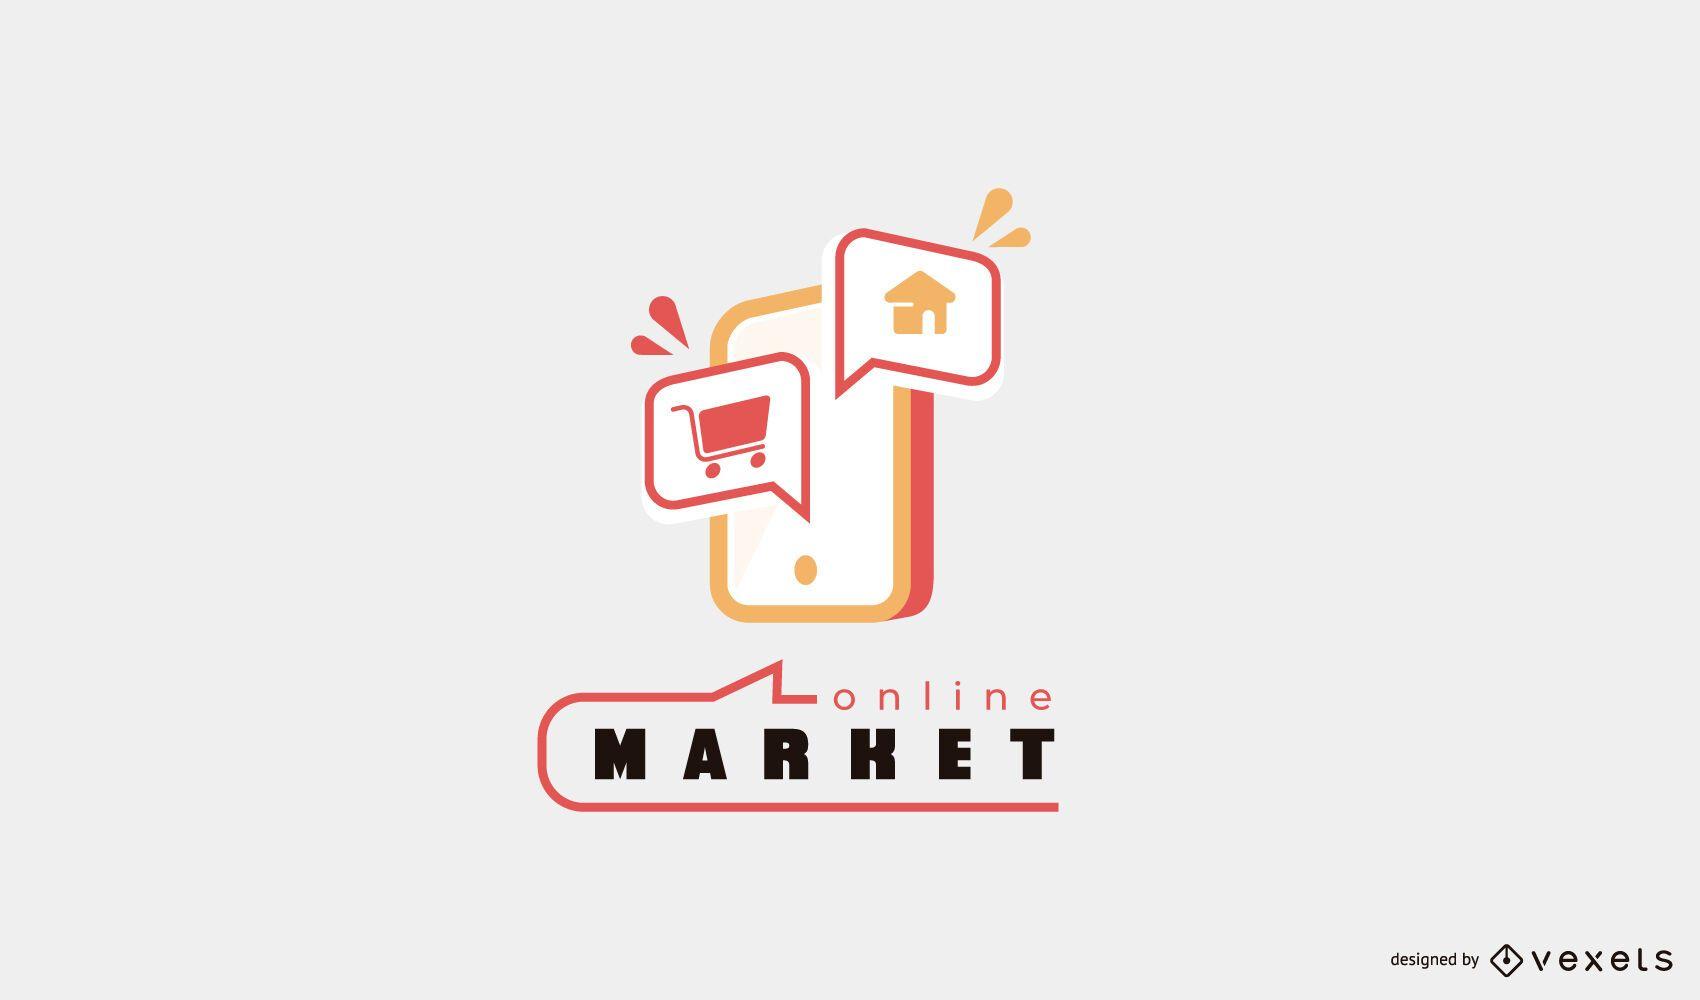 Online market phone logo design